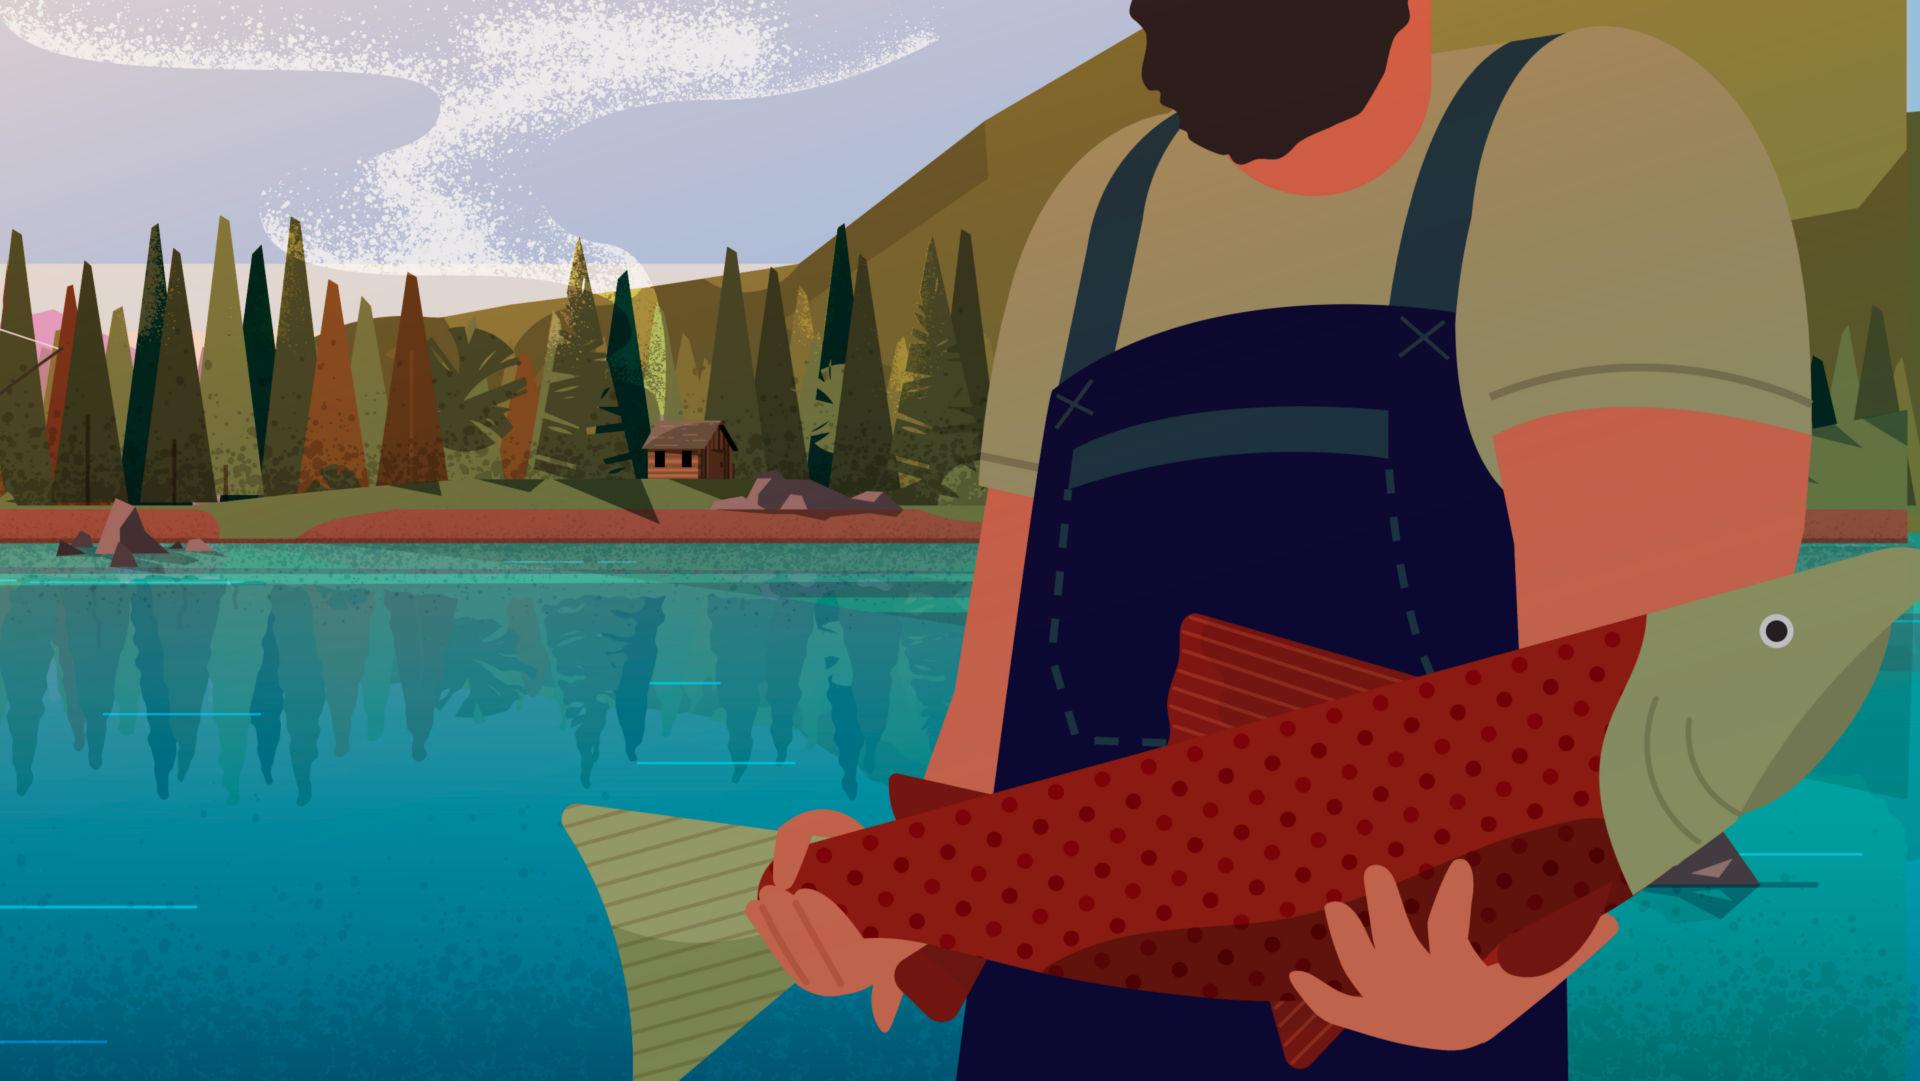 Illustrated image of fishermen catching salmon in Bristol Bay.